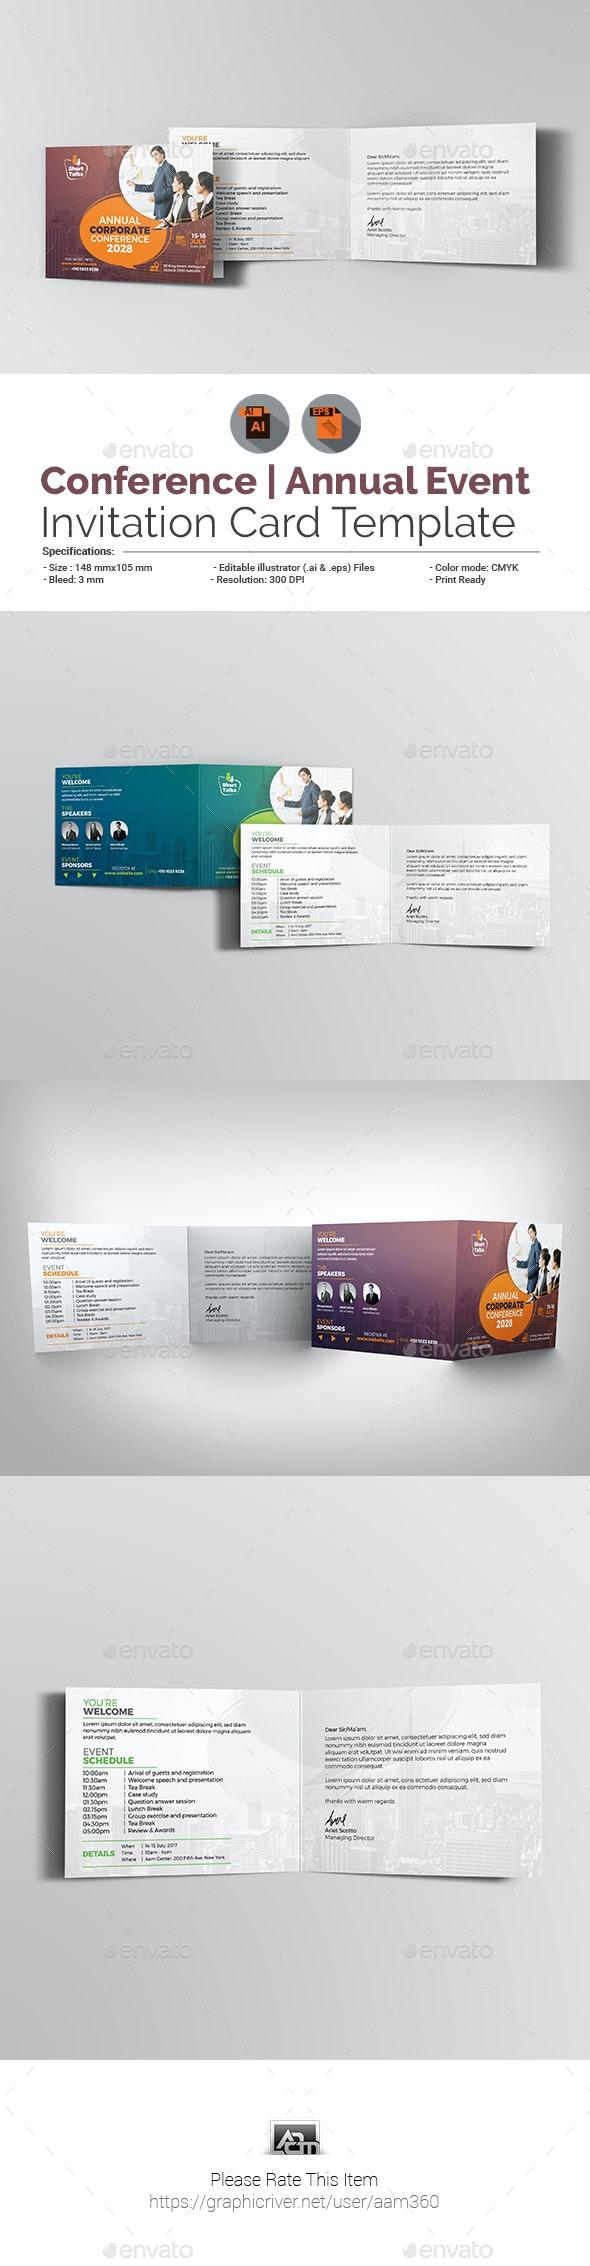 Annual Corporate Conference Invitation Card - Cards & Invites Print Templates